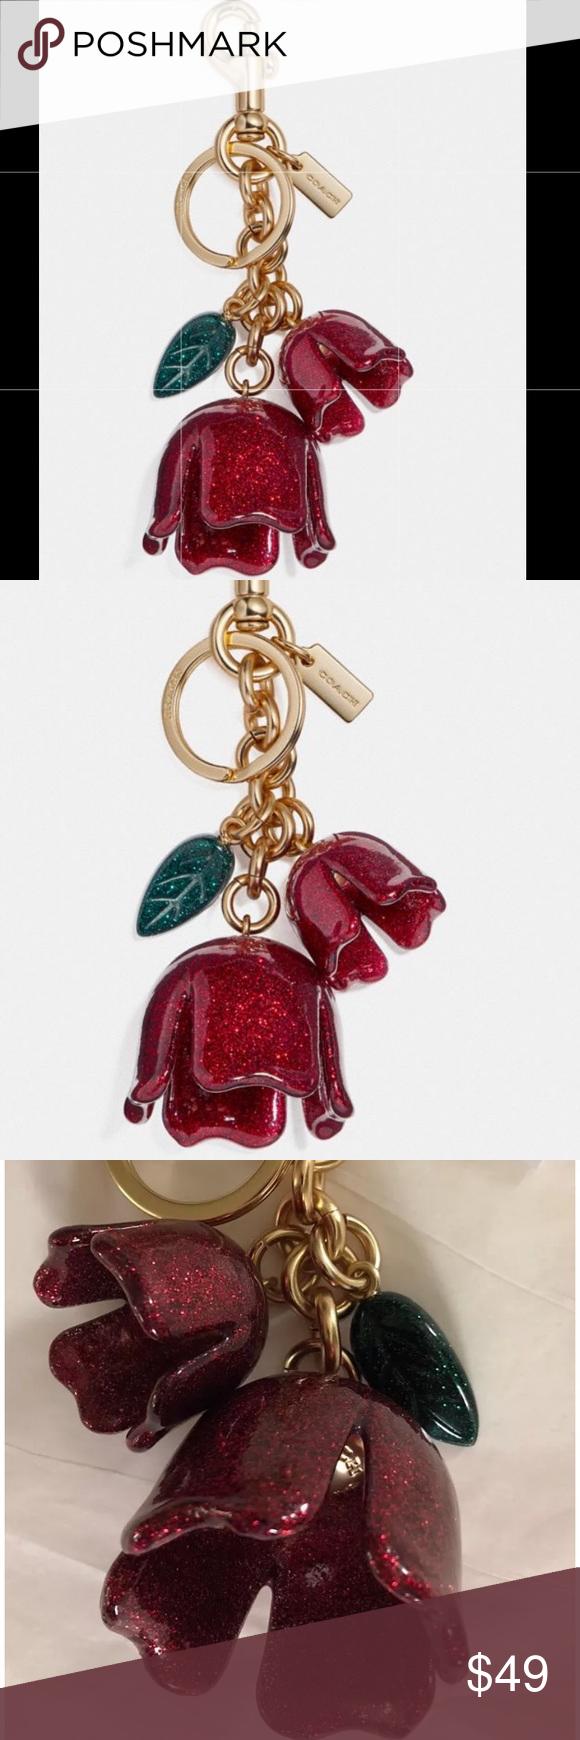 4d83463a Authentic COACH glitter tea rose bag charm-Red.🌹 NWT | My Posh ...